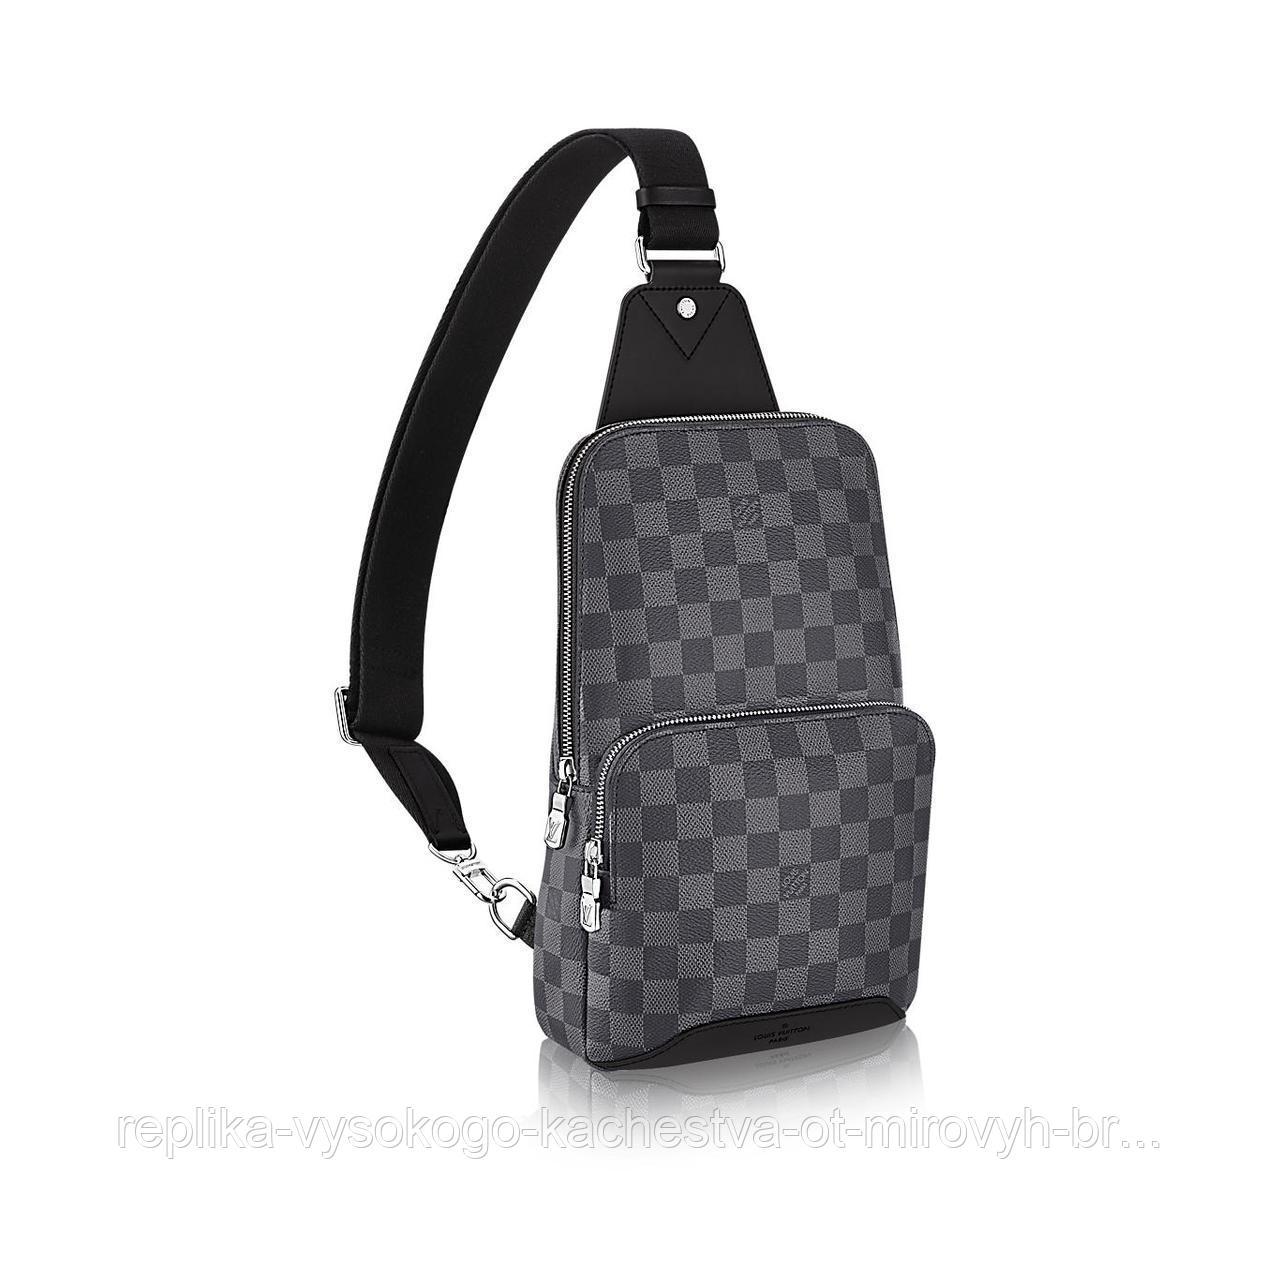 Сумка-мессенджер Avenue Sling Bag